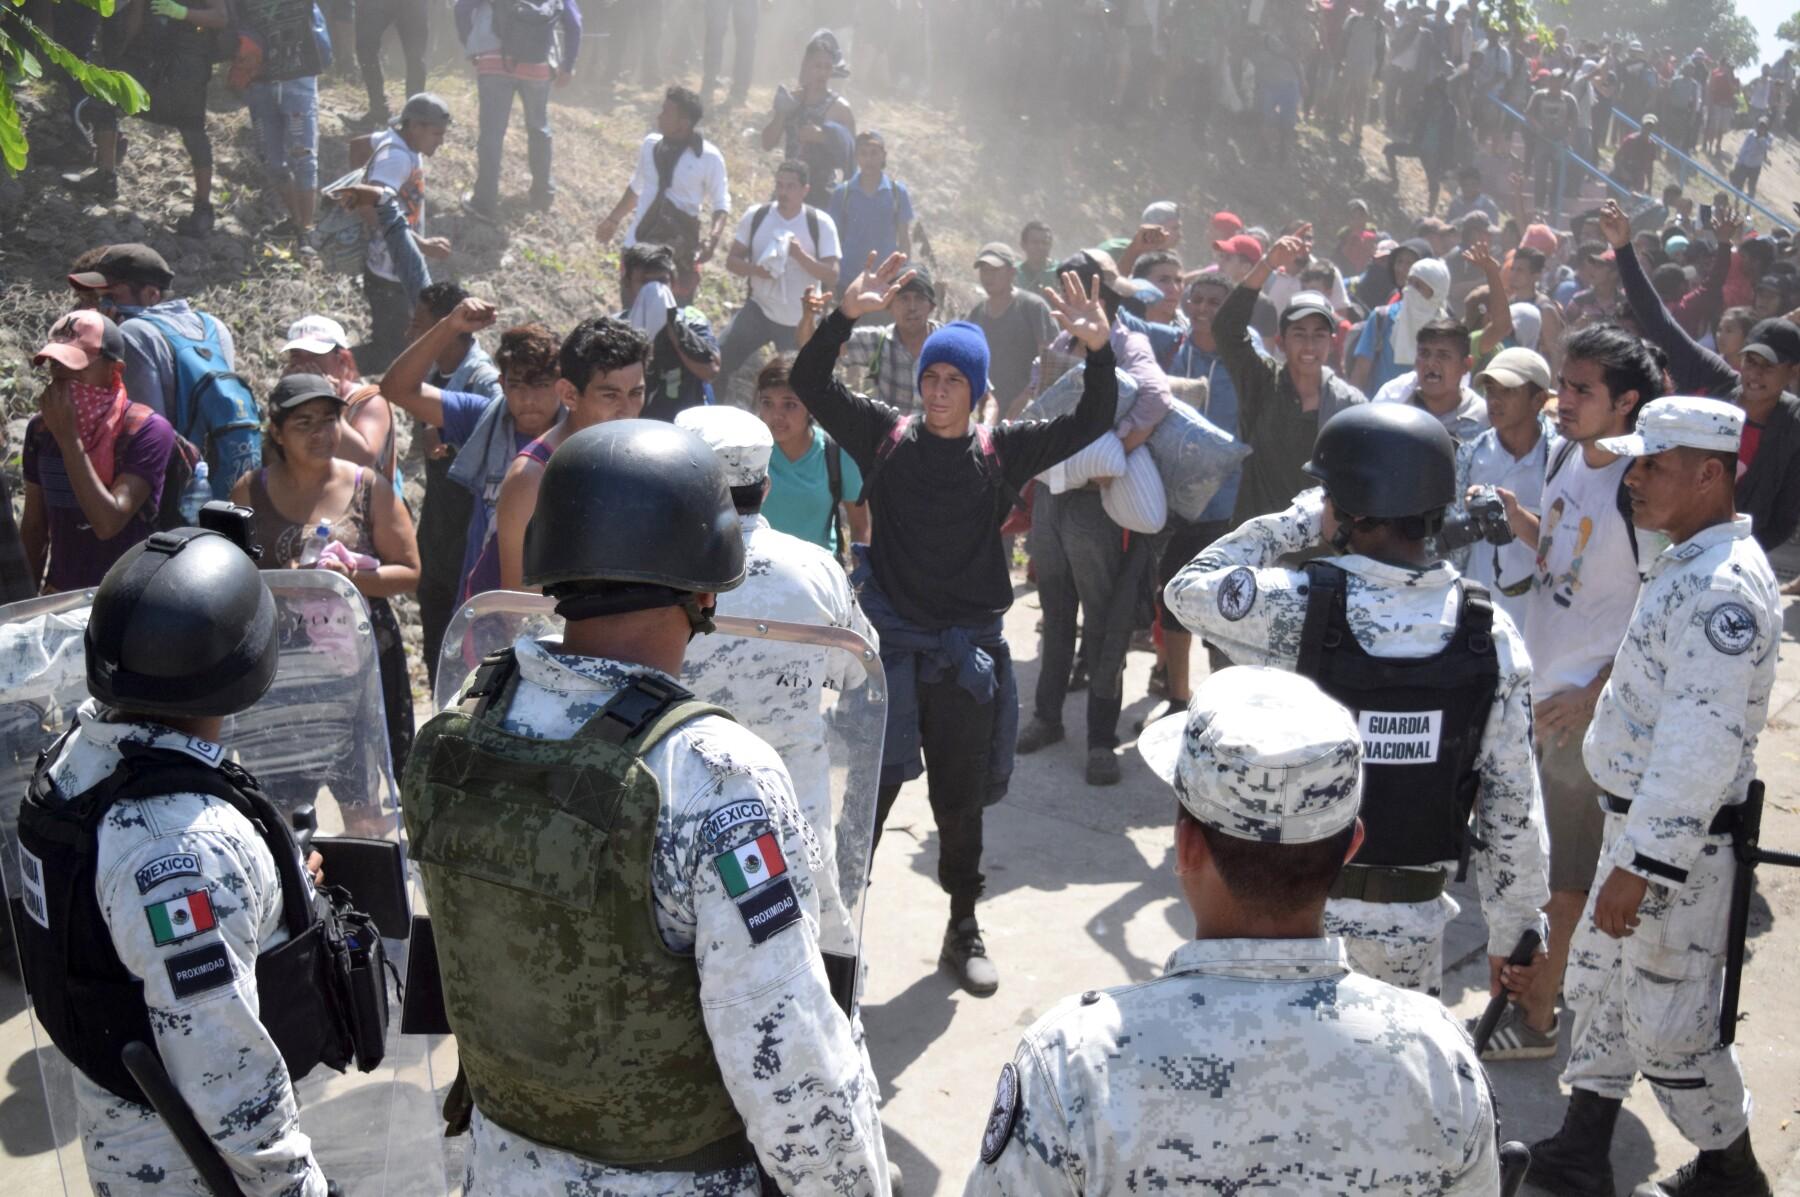 caravana migrante chiapas